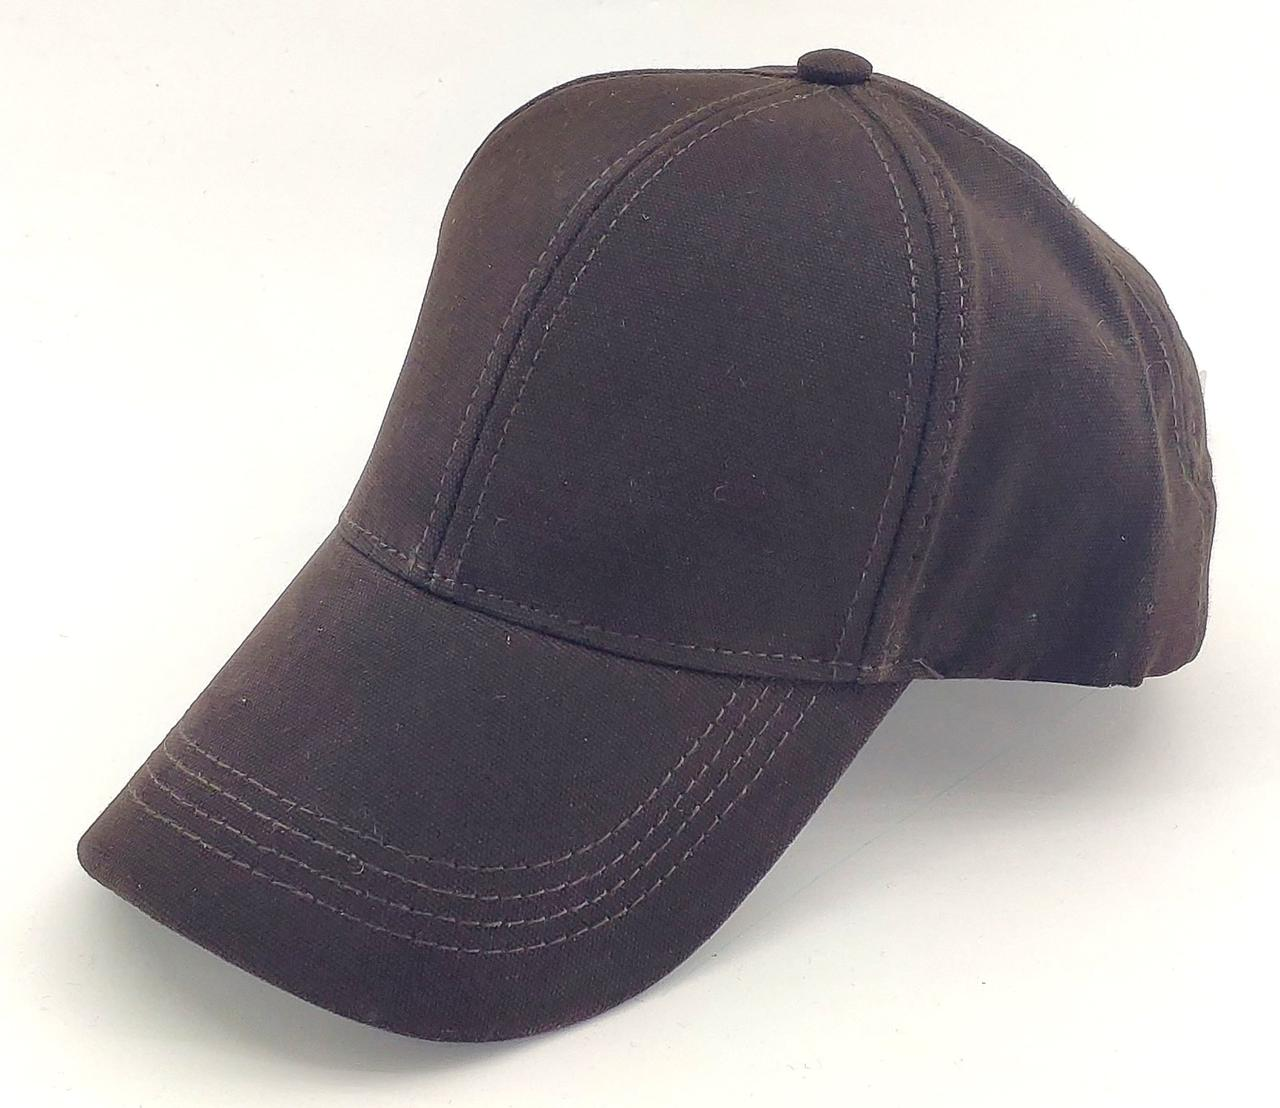 Бейсболка мужская кепка с 59 по 62 размер бейсболки мужские кепки коттон для мужчин глубокие